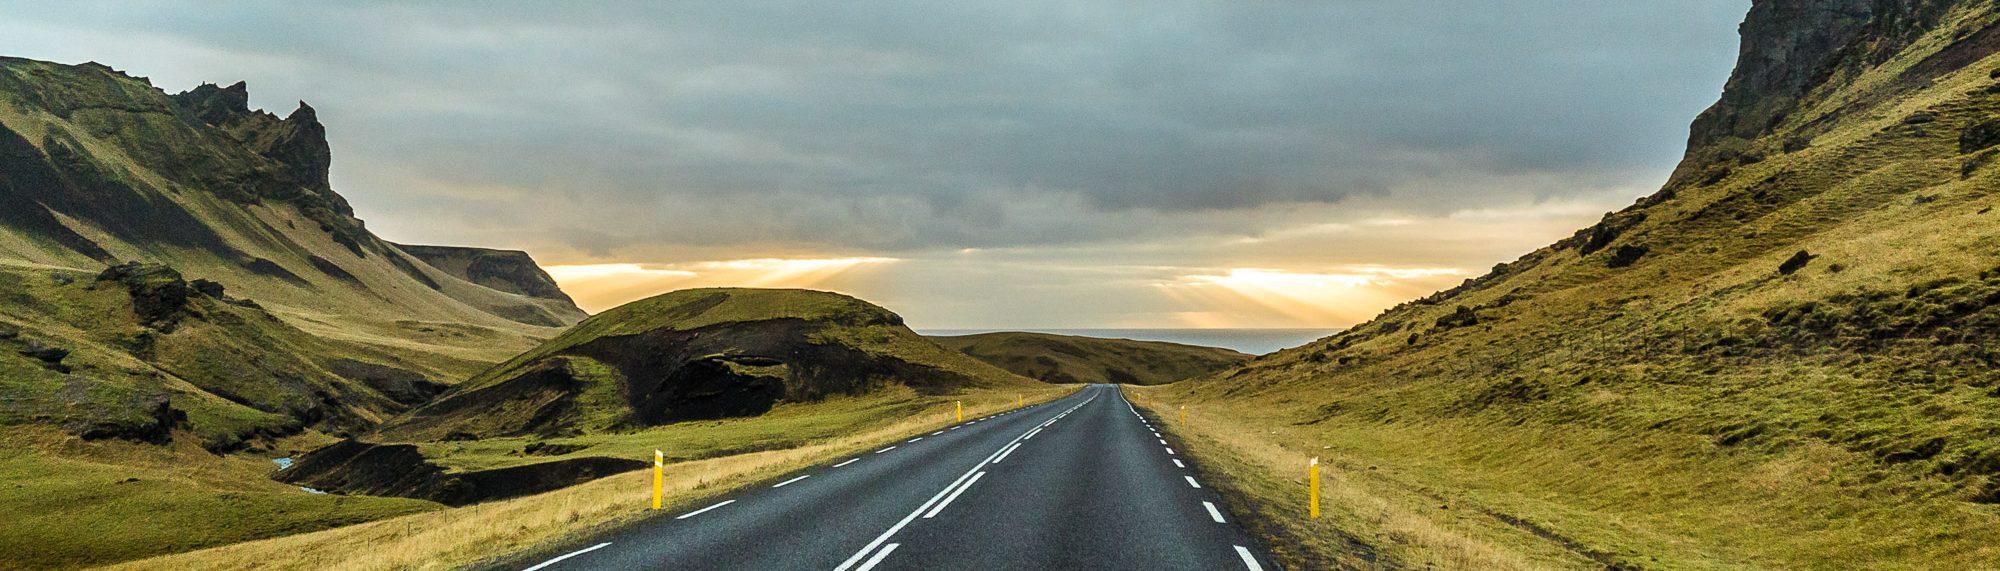 Road South Coast Iceland